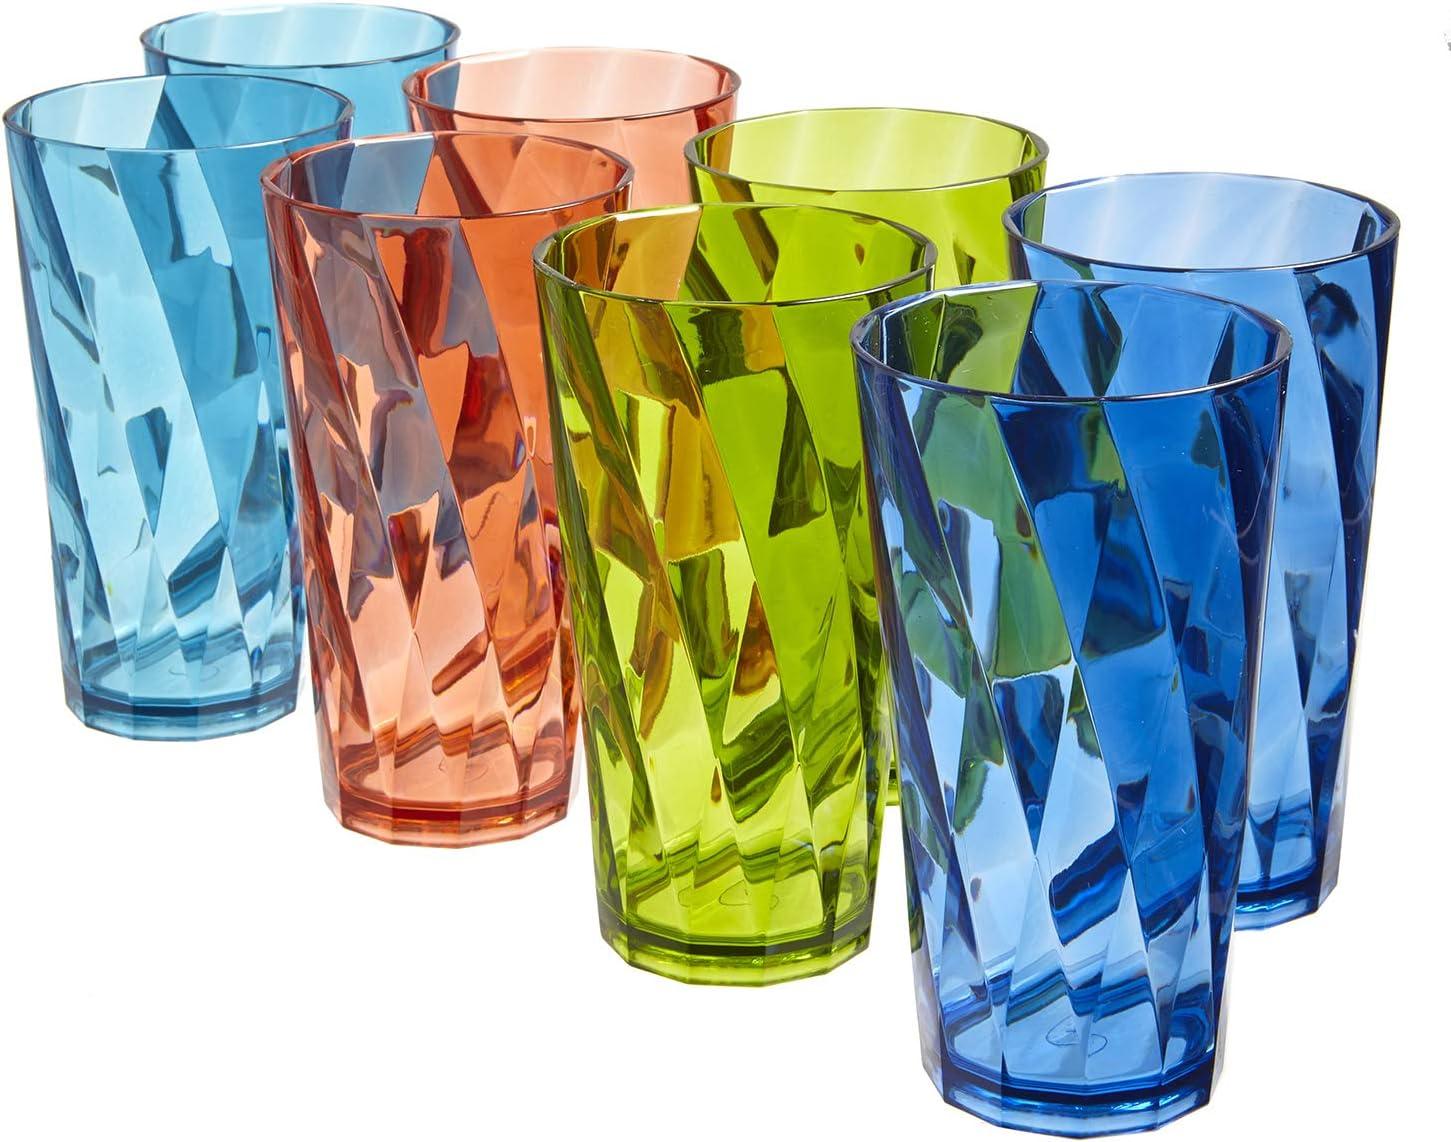 Optix 20 Ounce Plastic Tumblers Set Of 8 In 4 Basic Colors Tumblers Water Glasses